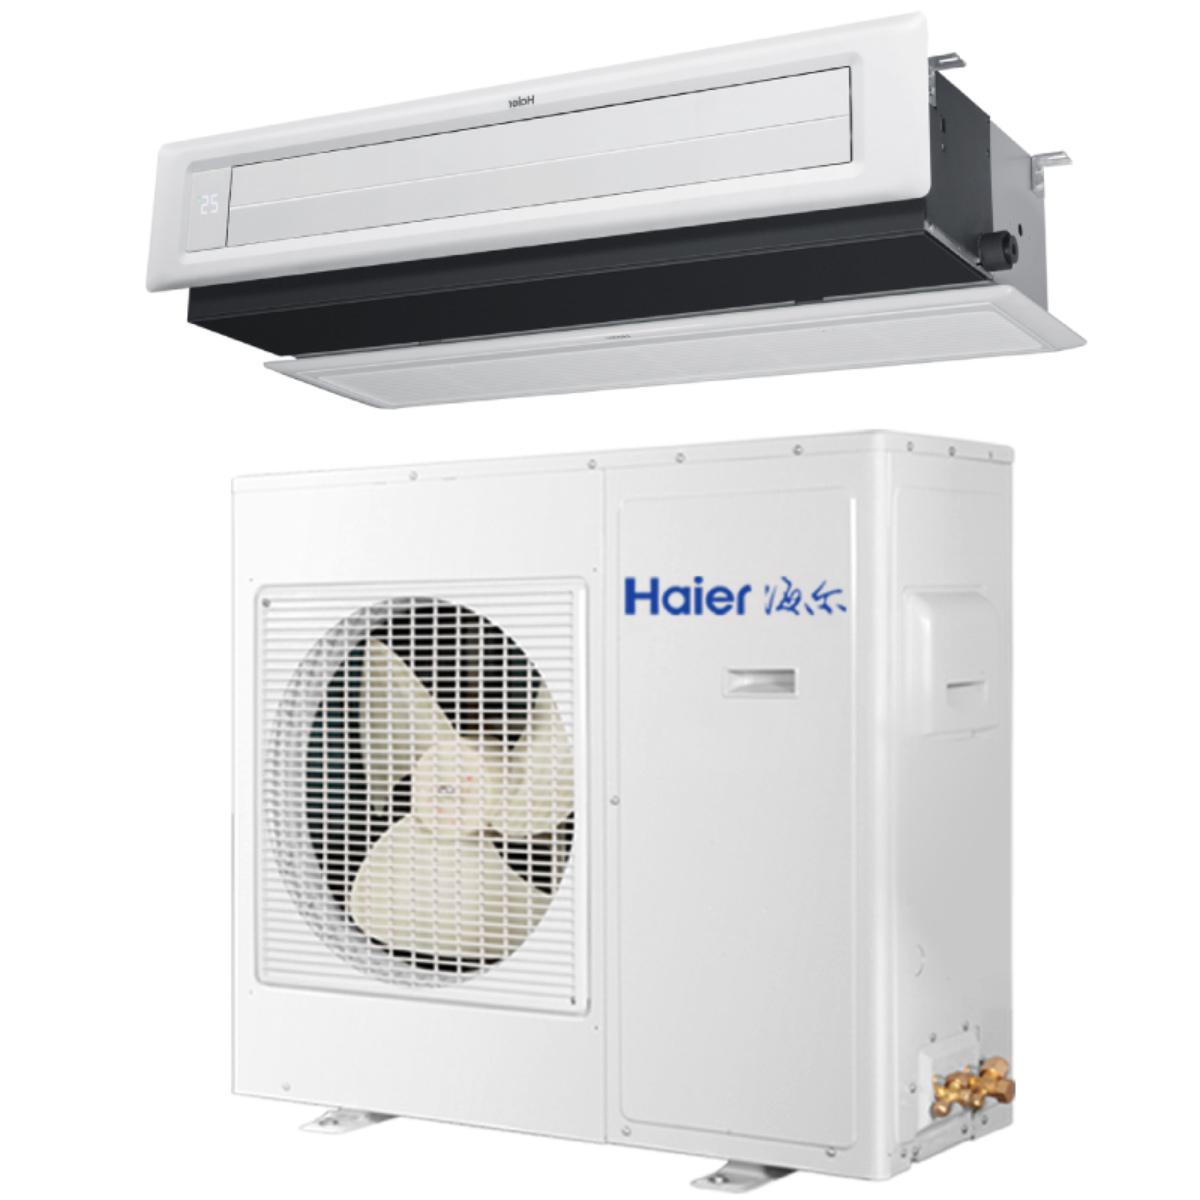 Haier/海尔 定频风管机 智尊系列 KFRd-36NW/53PAA12